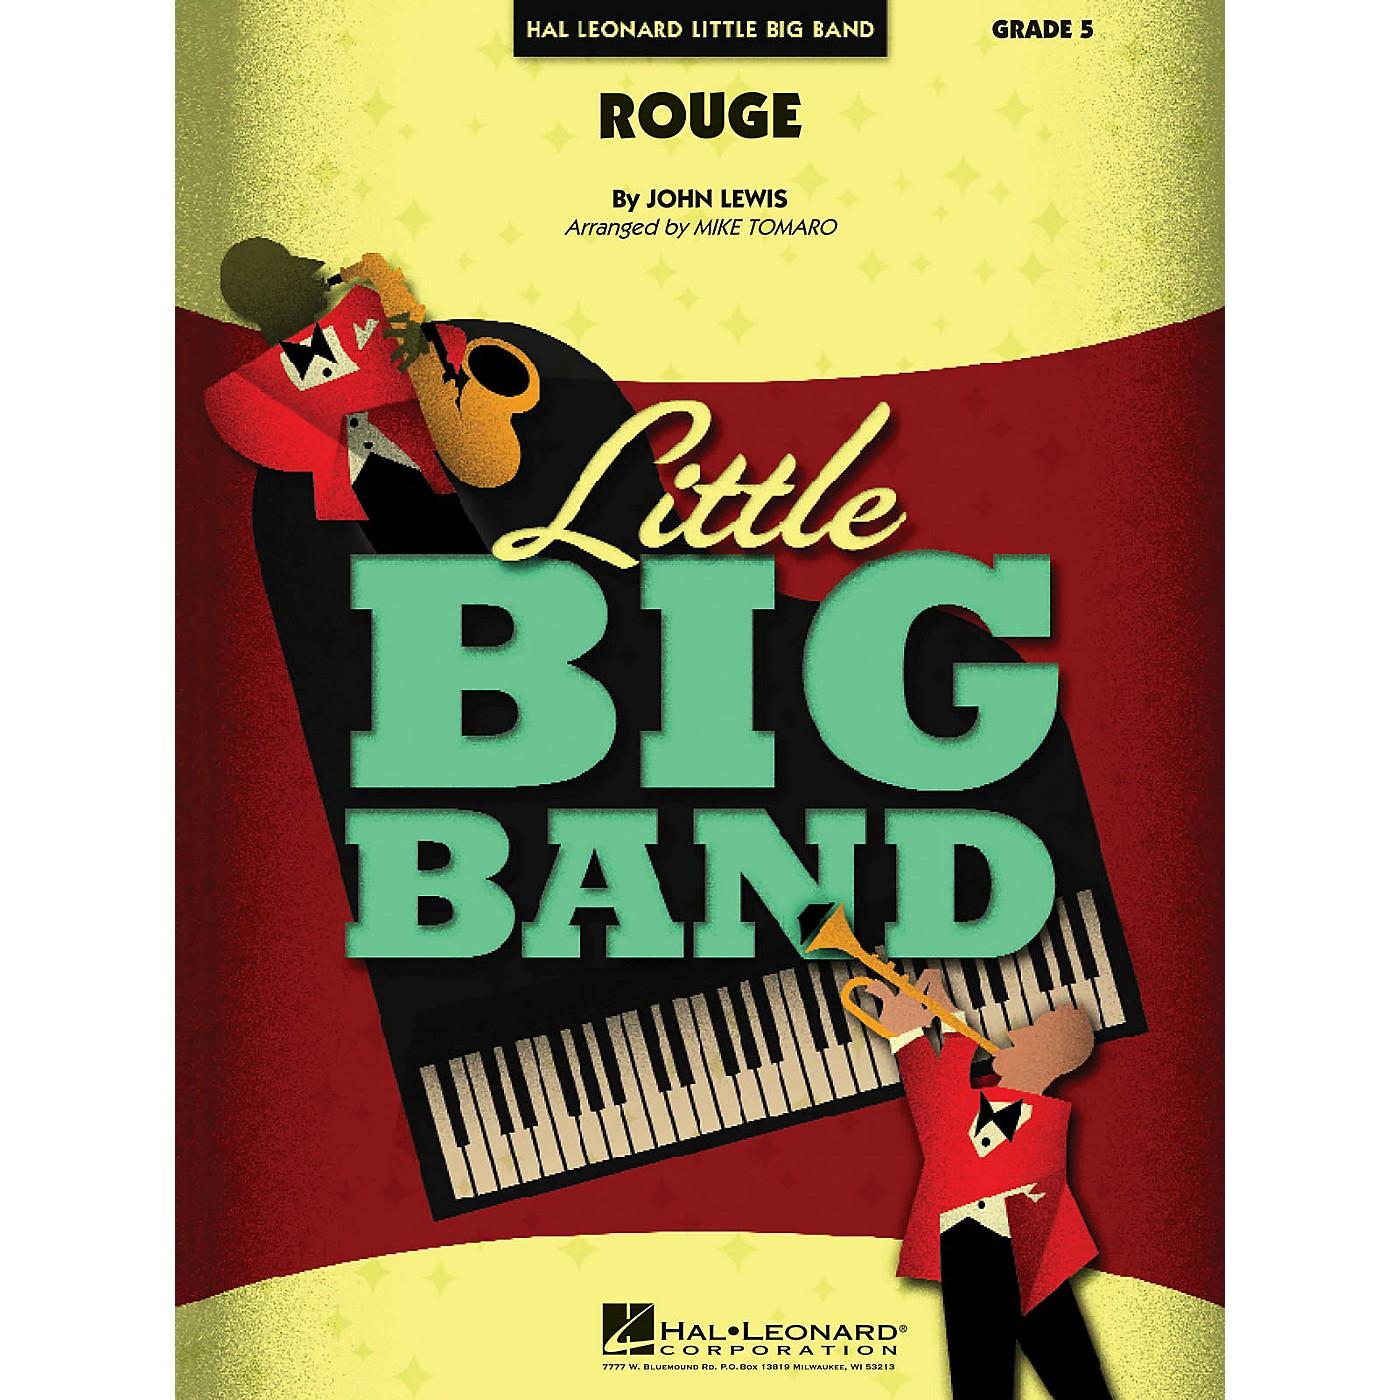 Hal Leonard Rouge Jazz Band Level 5 Arranged by Mike Tomaro thumbnail